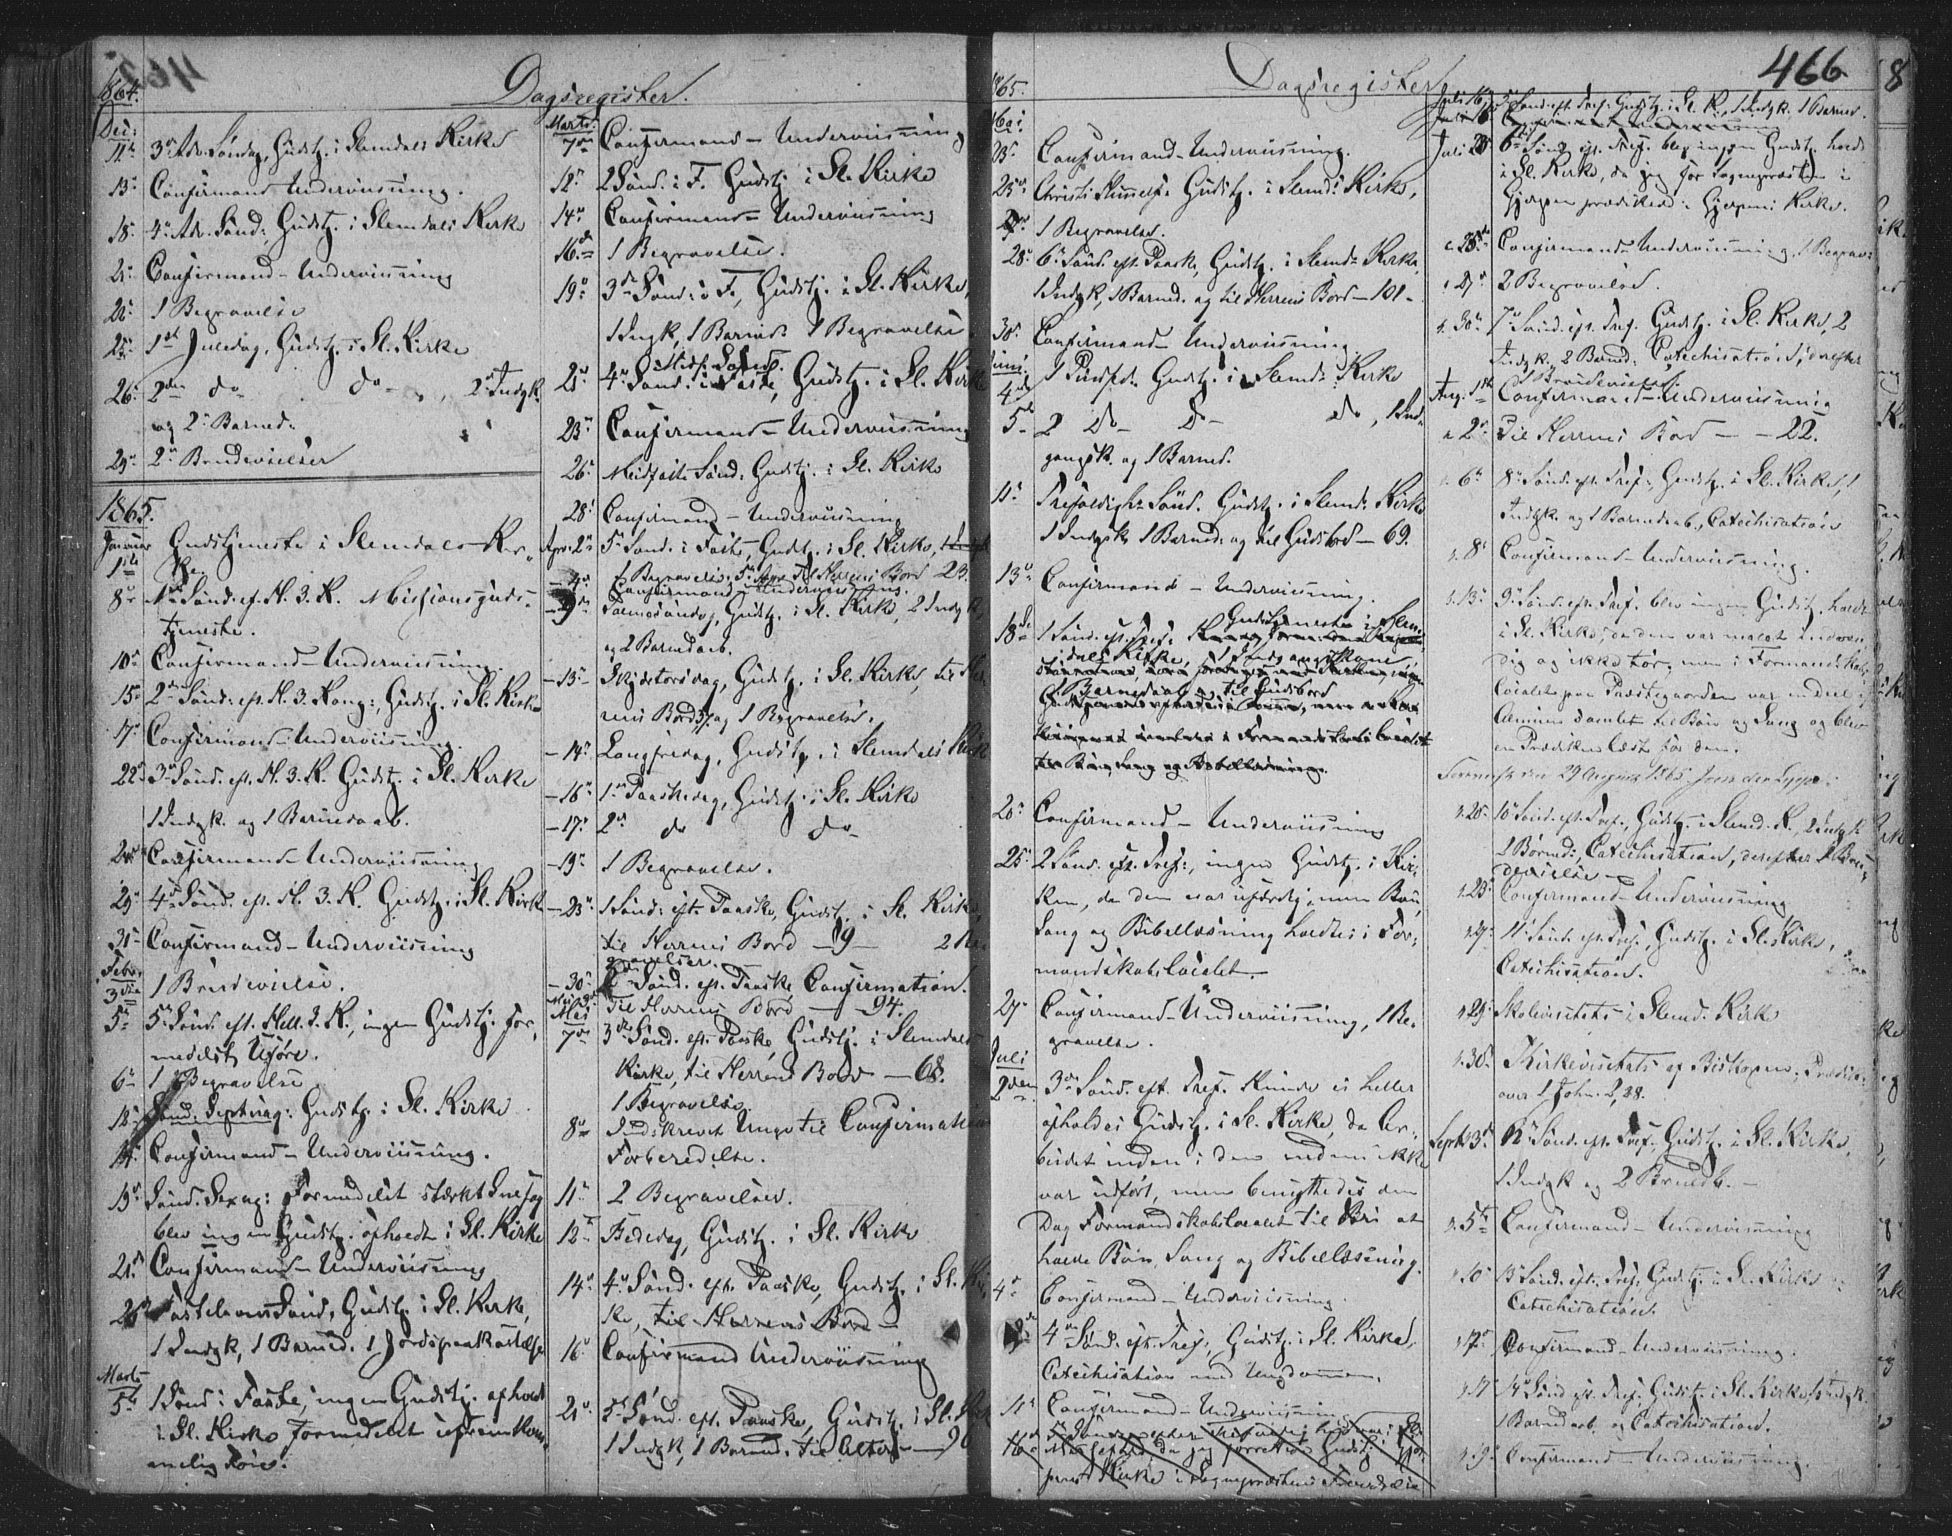 SAKO, Siljan kirkebøker, F/Fa/L0001: Parish register (official) no. 1, 1831-1870, p. 466